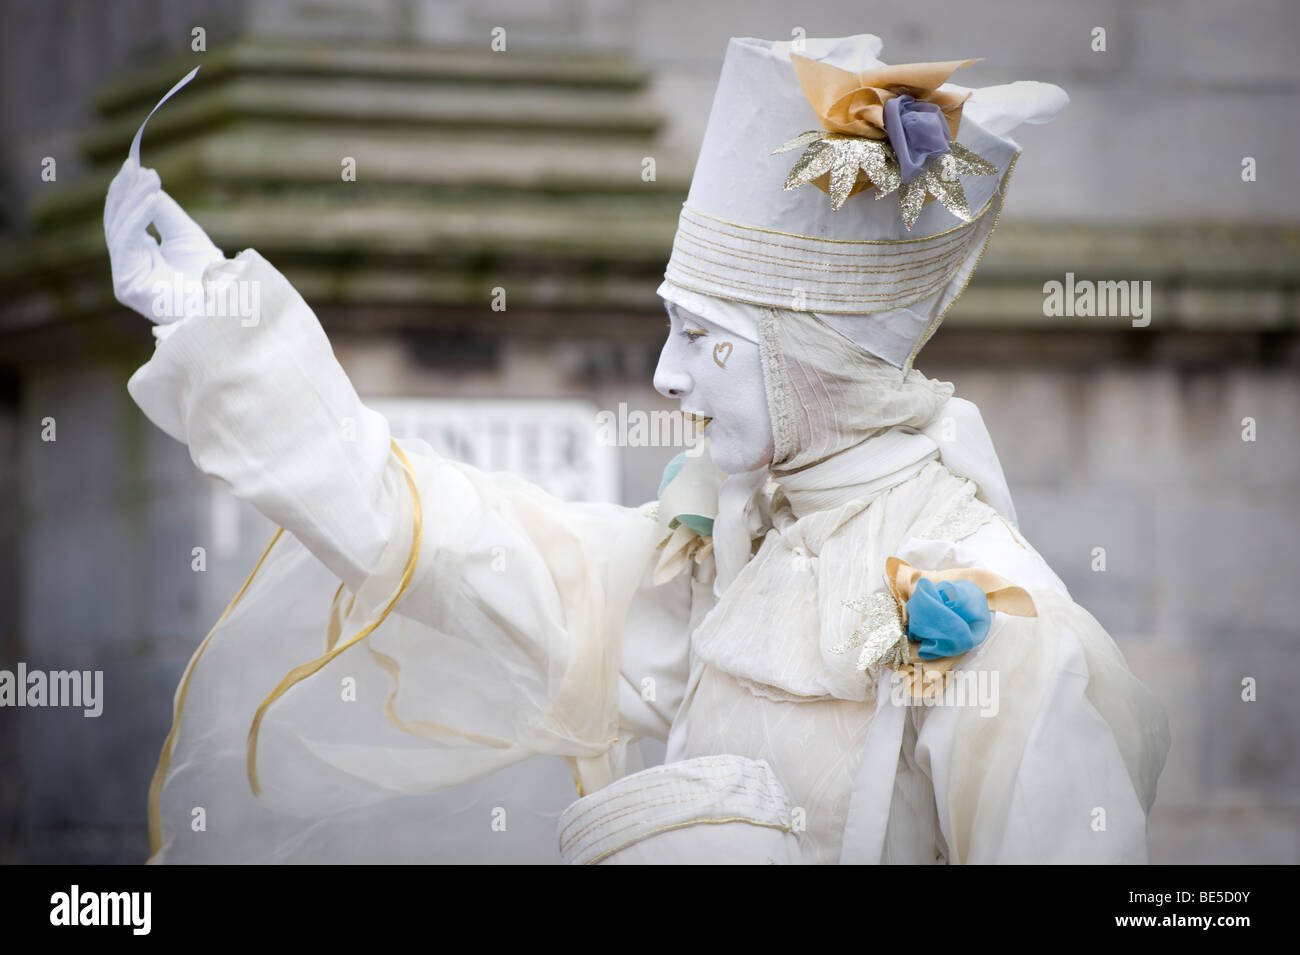 Street performer acting in the Royal Mile of Edinburgh as part of the 2009 Fringe festival, Scotland. UK - Stock Image